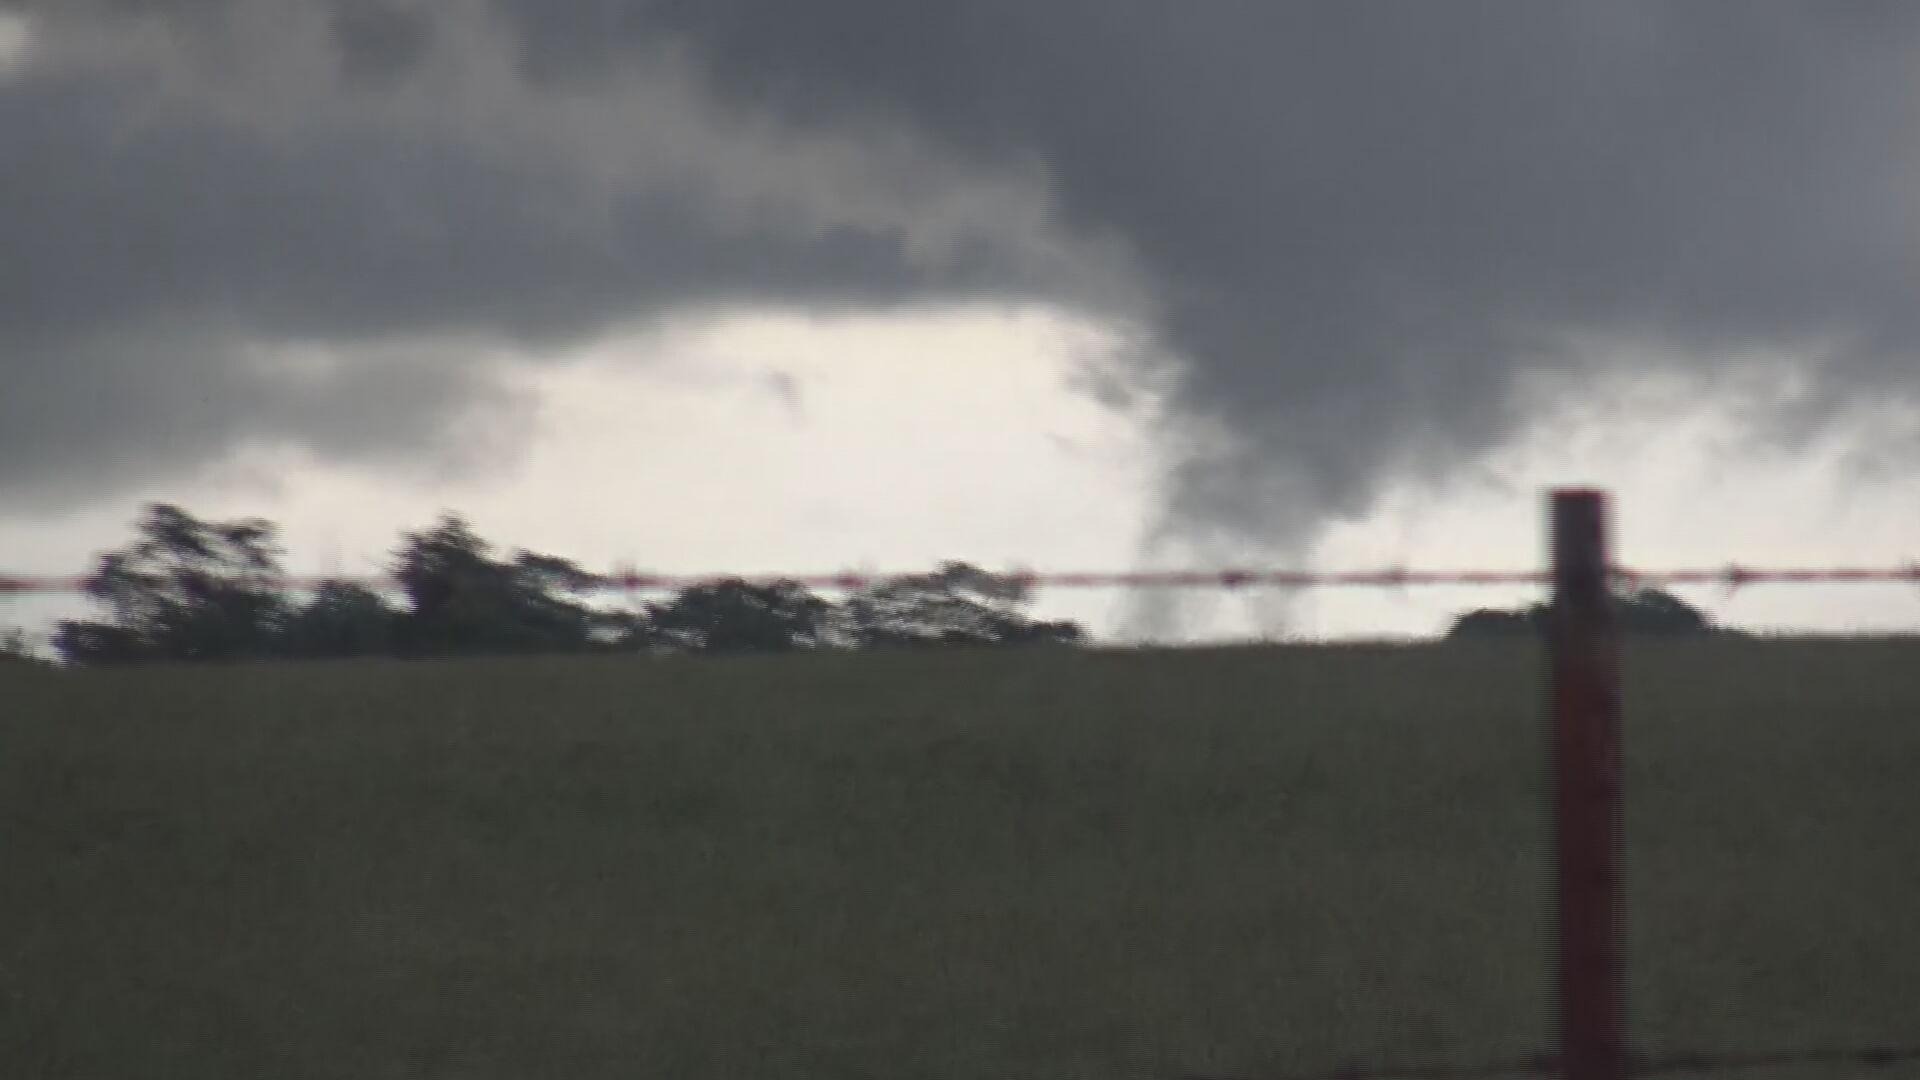 JD McManus Captures Tornado Northwest Of Siloam Springs